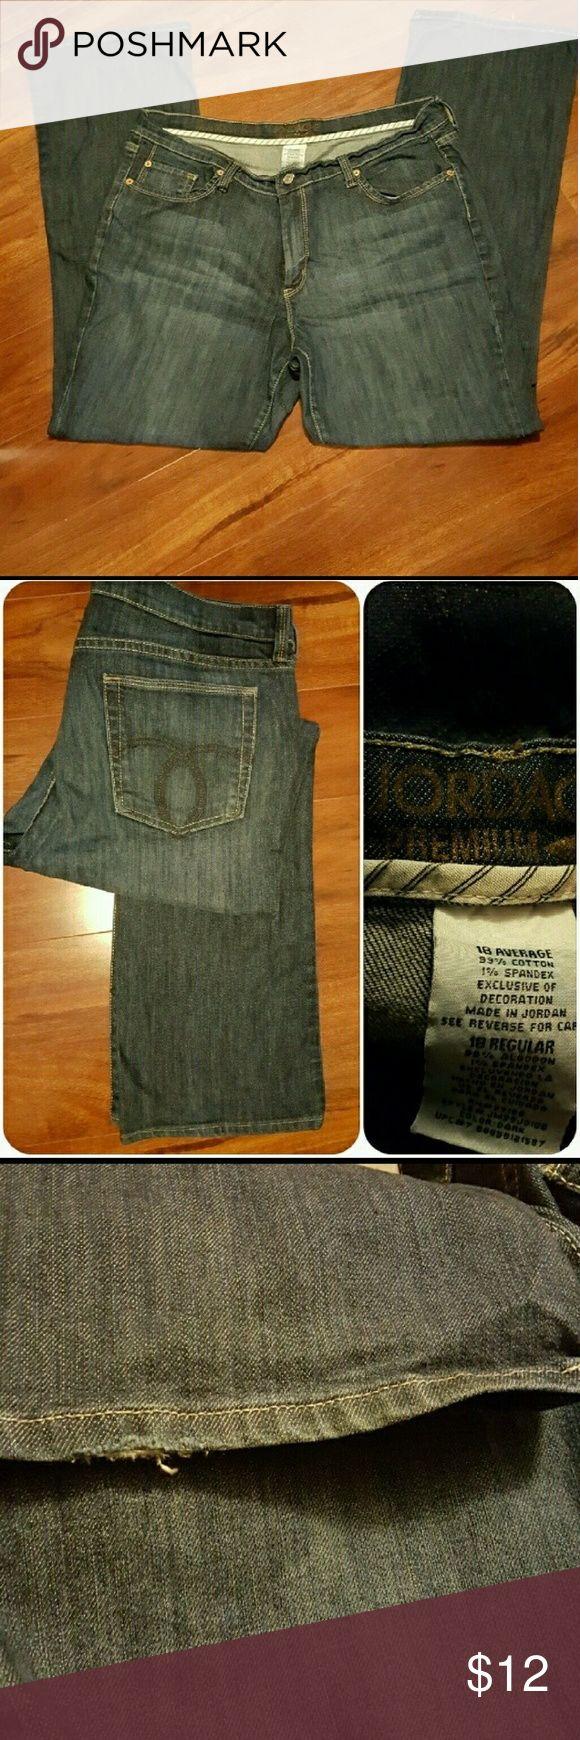 "Jordache Premium Denim Modern Boot Jordache modern boot jeans. Size 18 Average. Small flaw on bottom left pants leg pic 3. 99% cotton, 1% spandex.  Approx flat lay measurements  Waist      18.5 Inseam   31.5 Thigh      13"" Jeans Boot Cut"